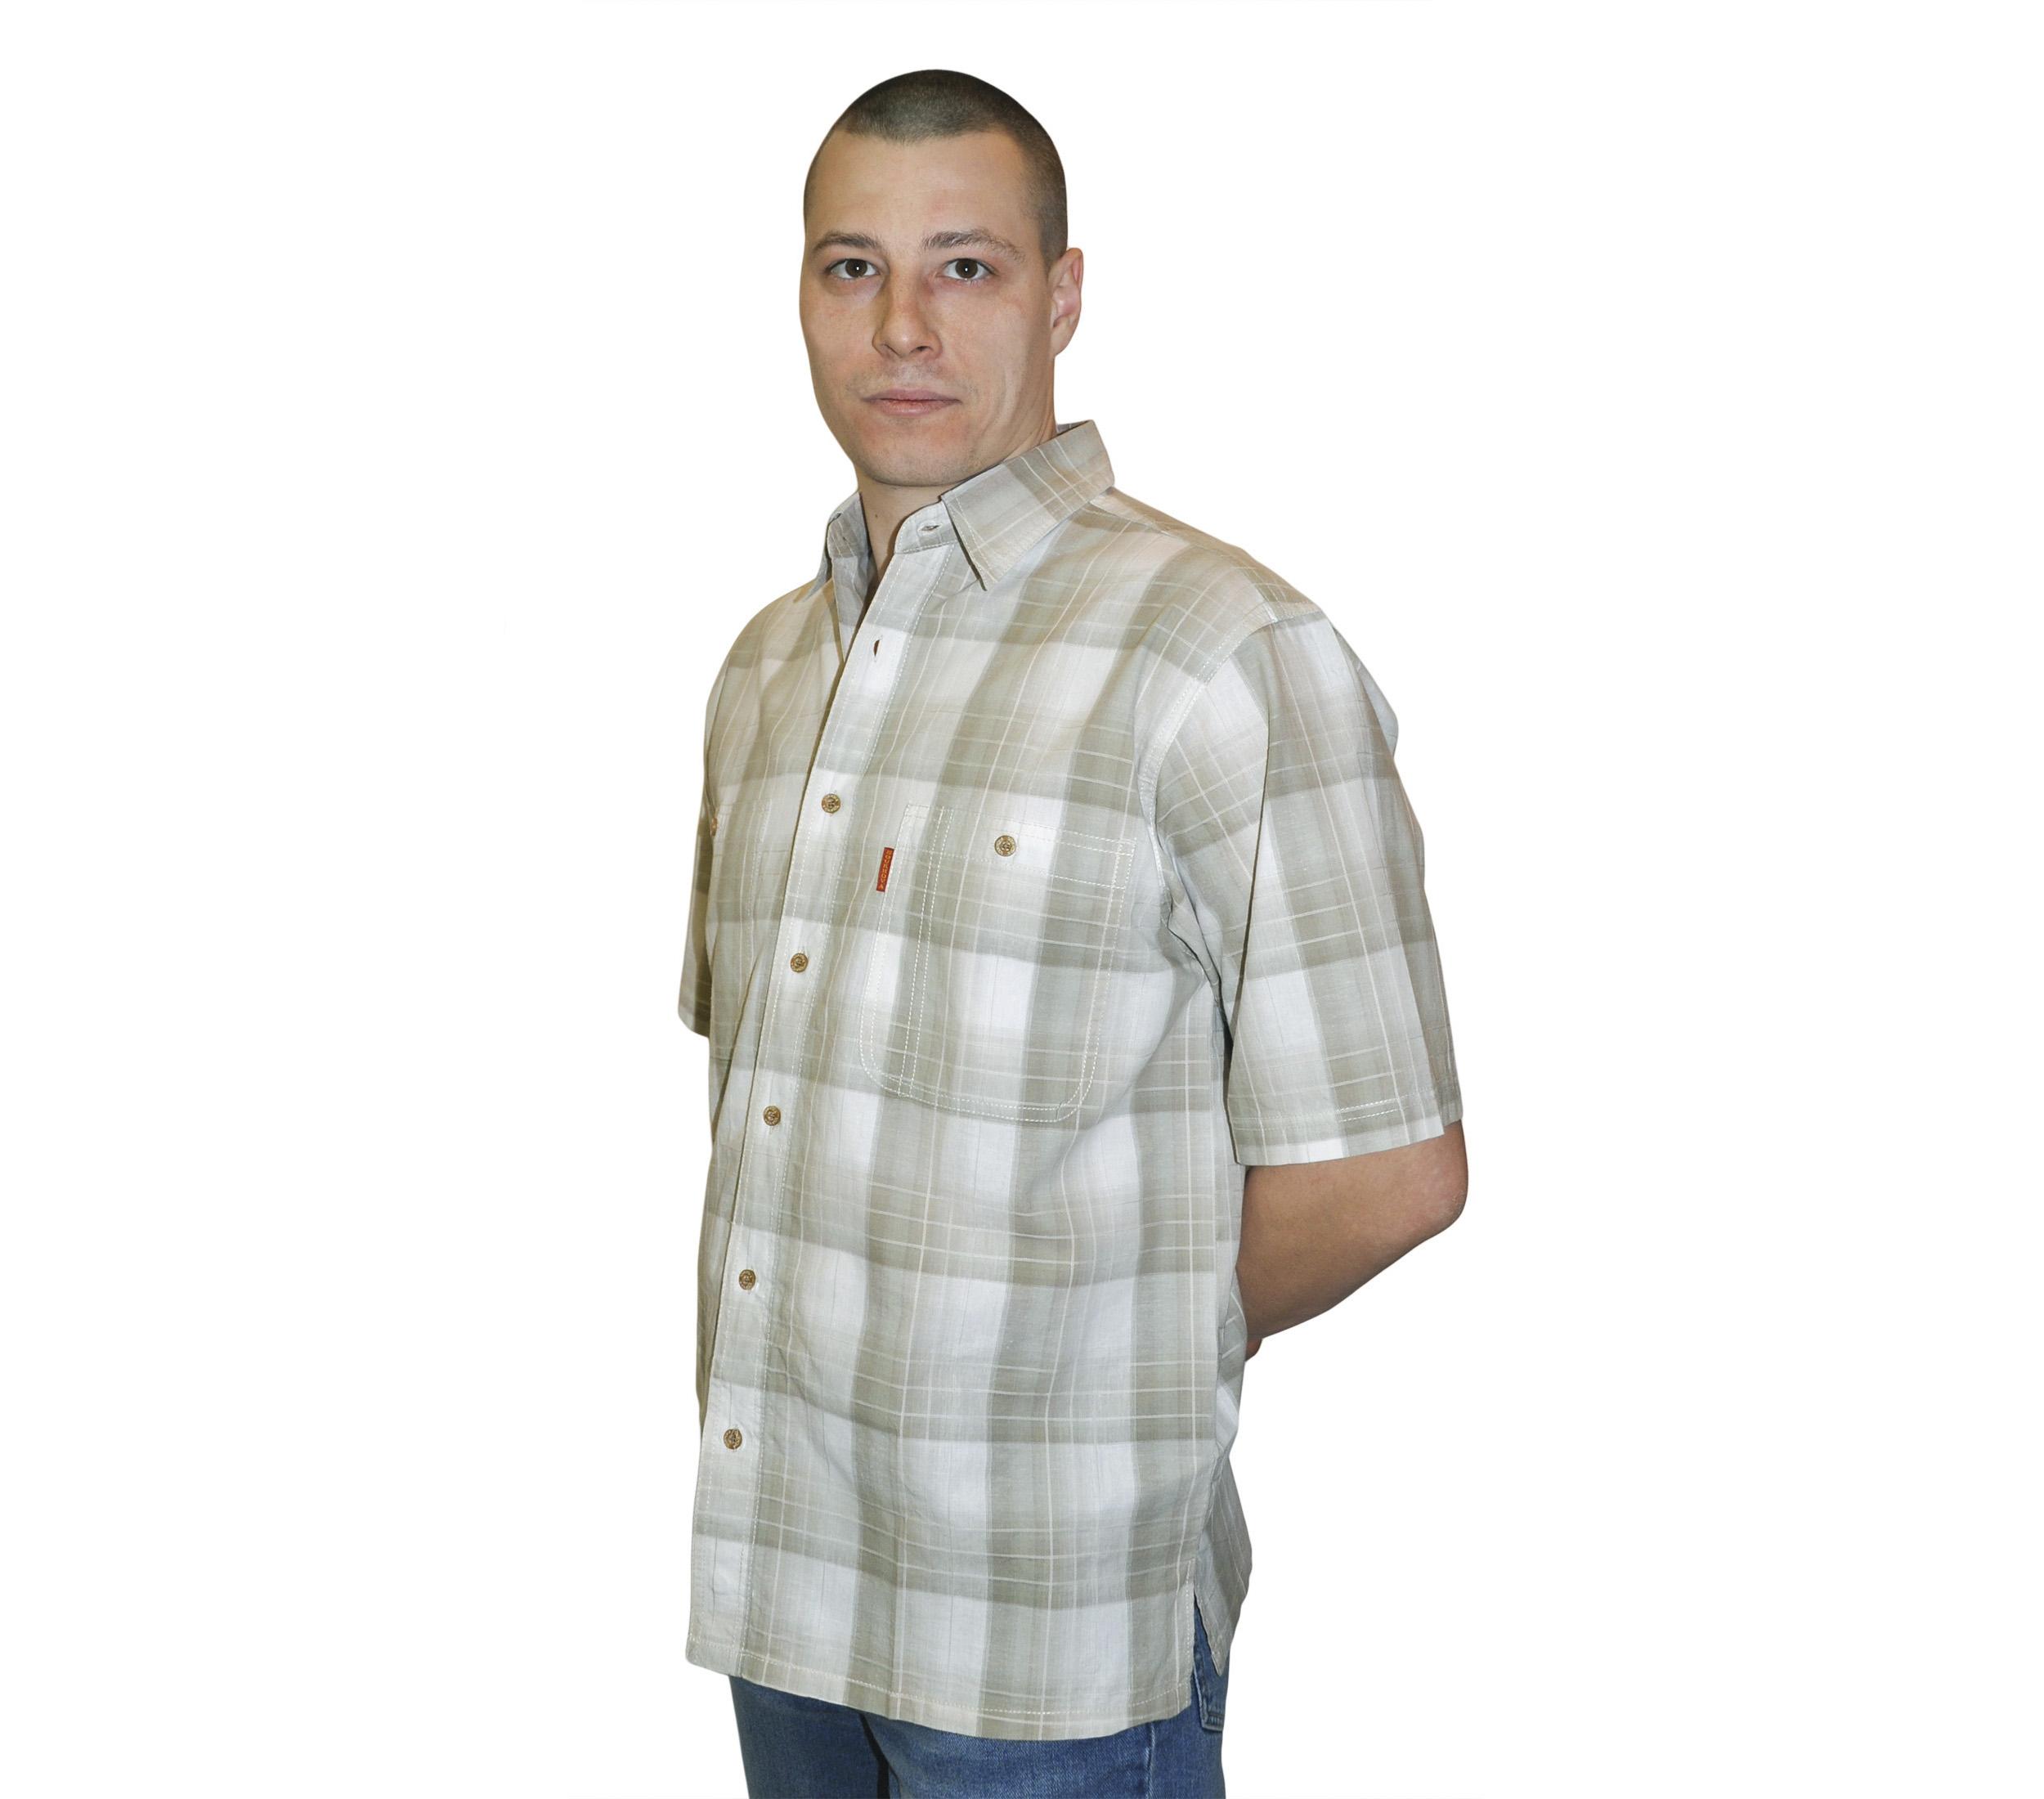 Рубашка с коротким рукавом в крупную серо-зеленоватую клетку.